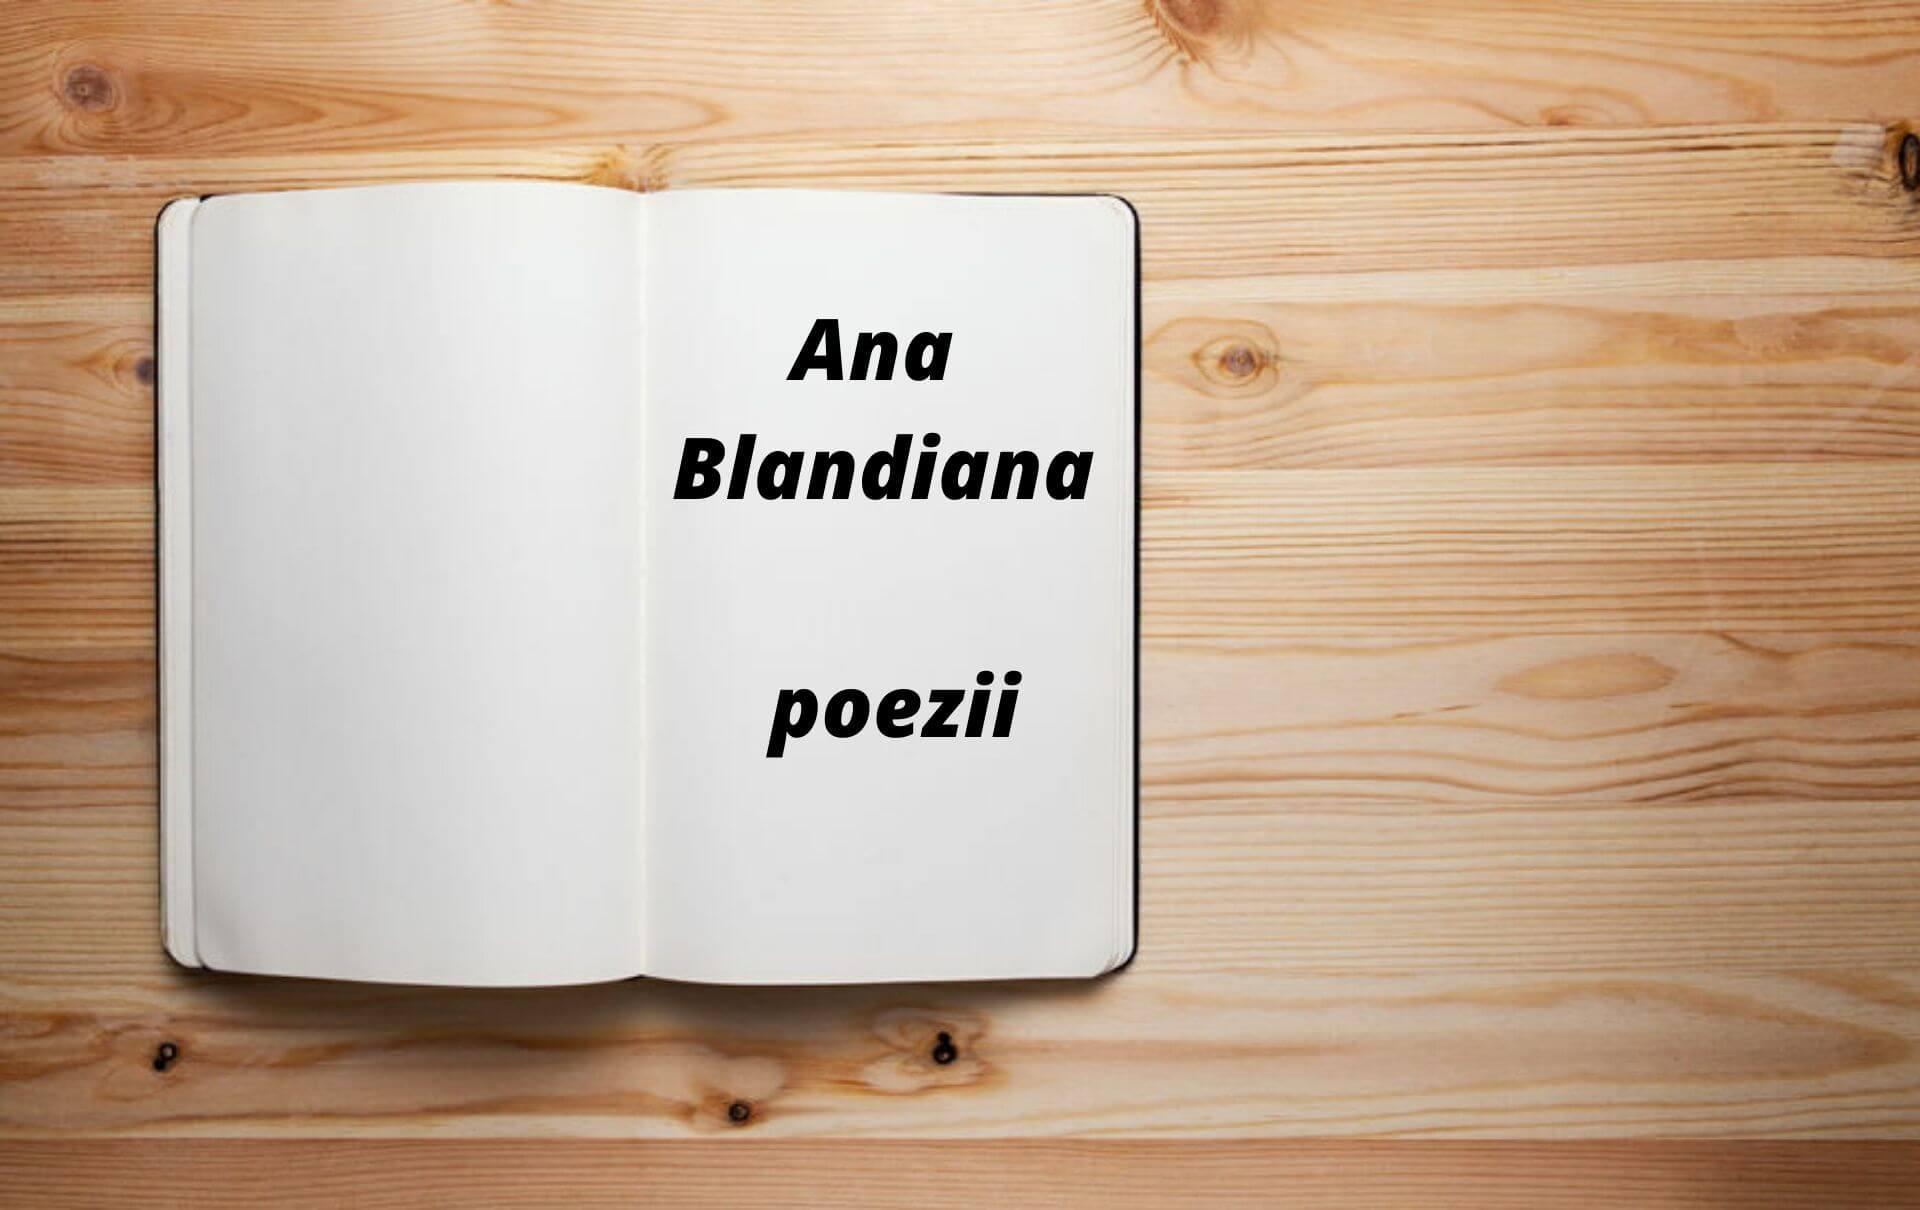 arătos cel mai bun site web inventar imens Ana Blandiana Poezii - Cele Mai Frumoase și Emoționante Versuri ...